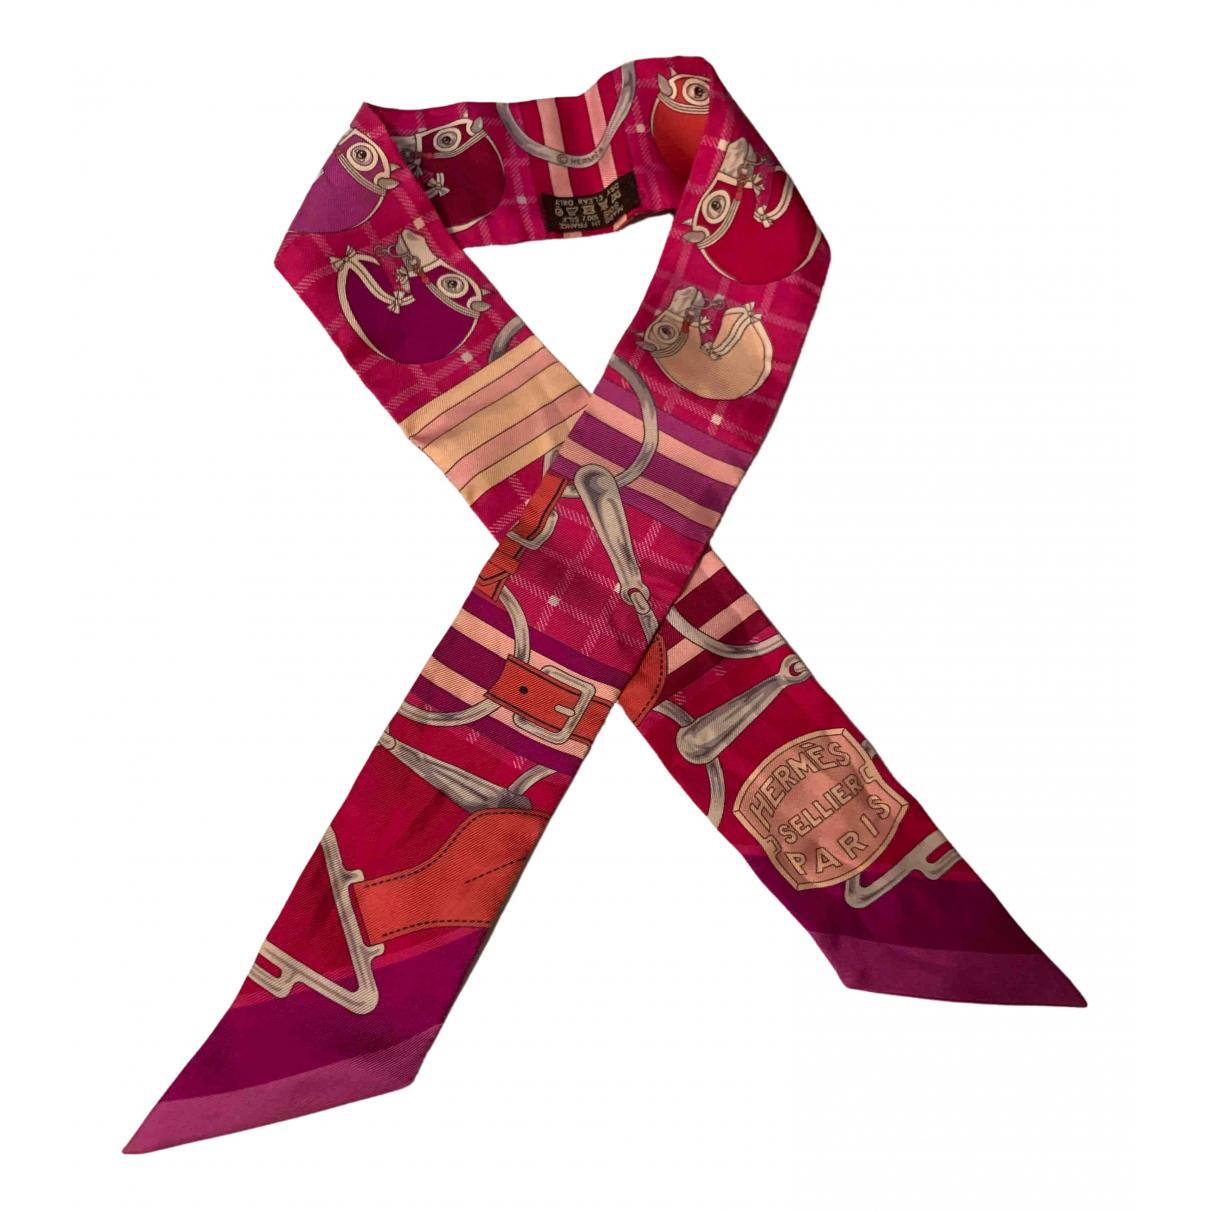 Hermes - Foulard Twilly 86 pour femme en soie - rose